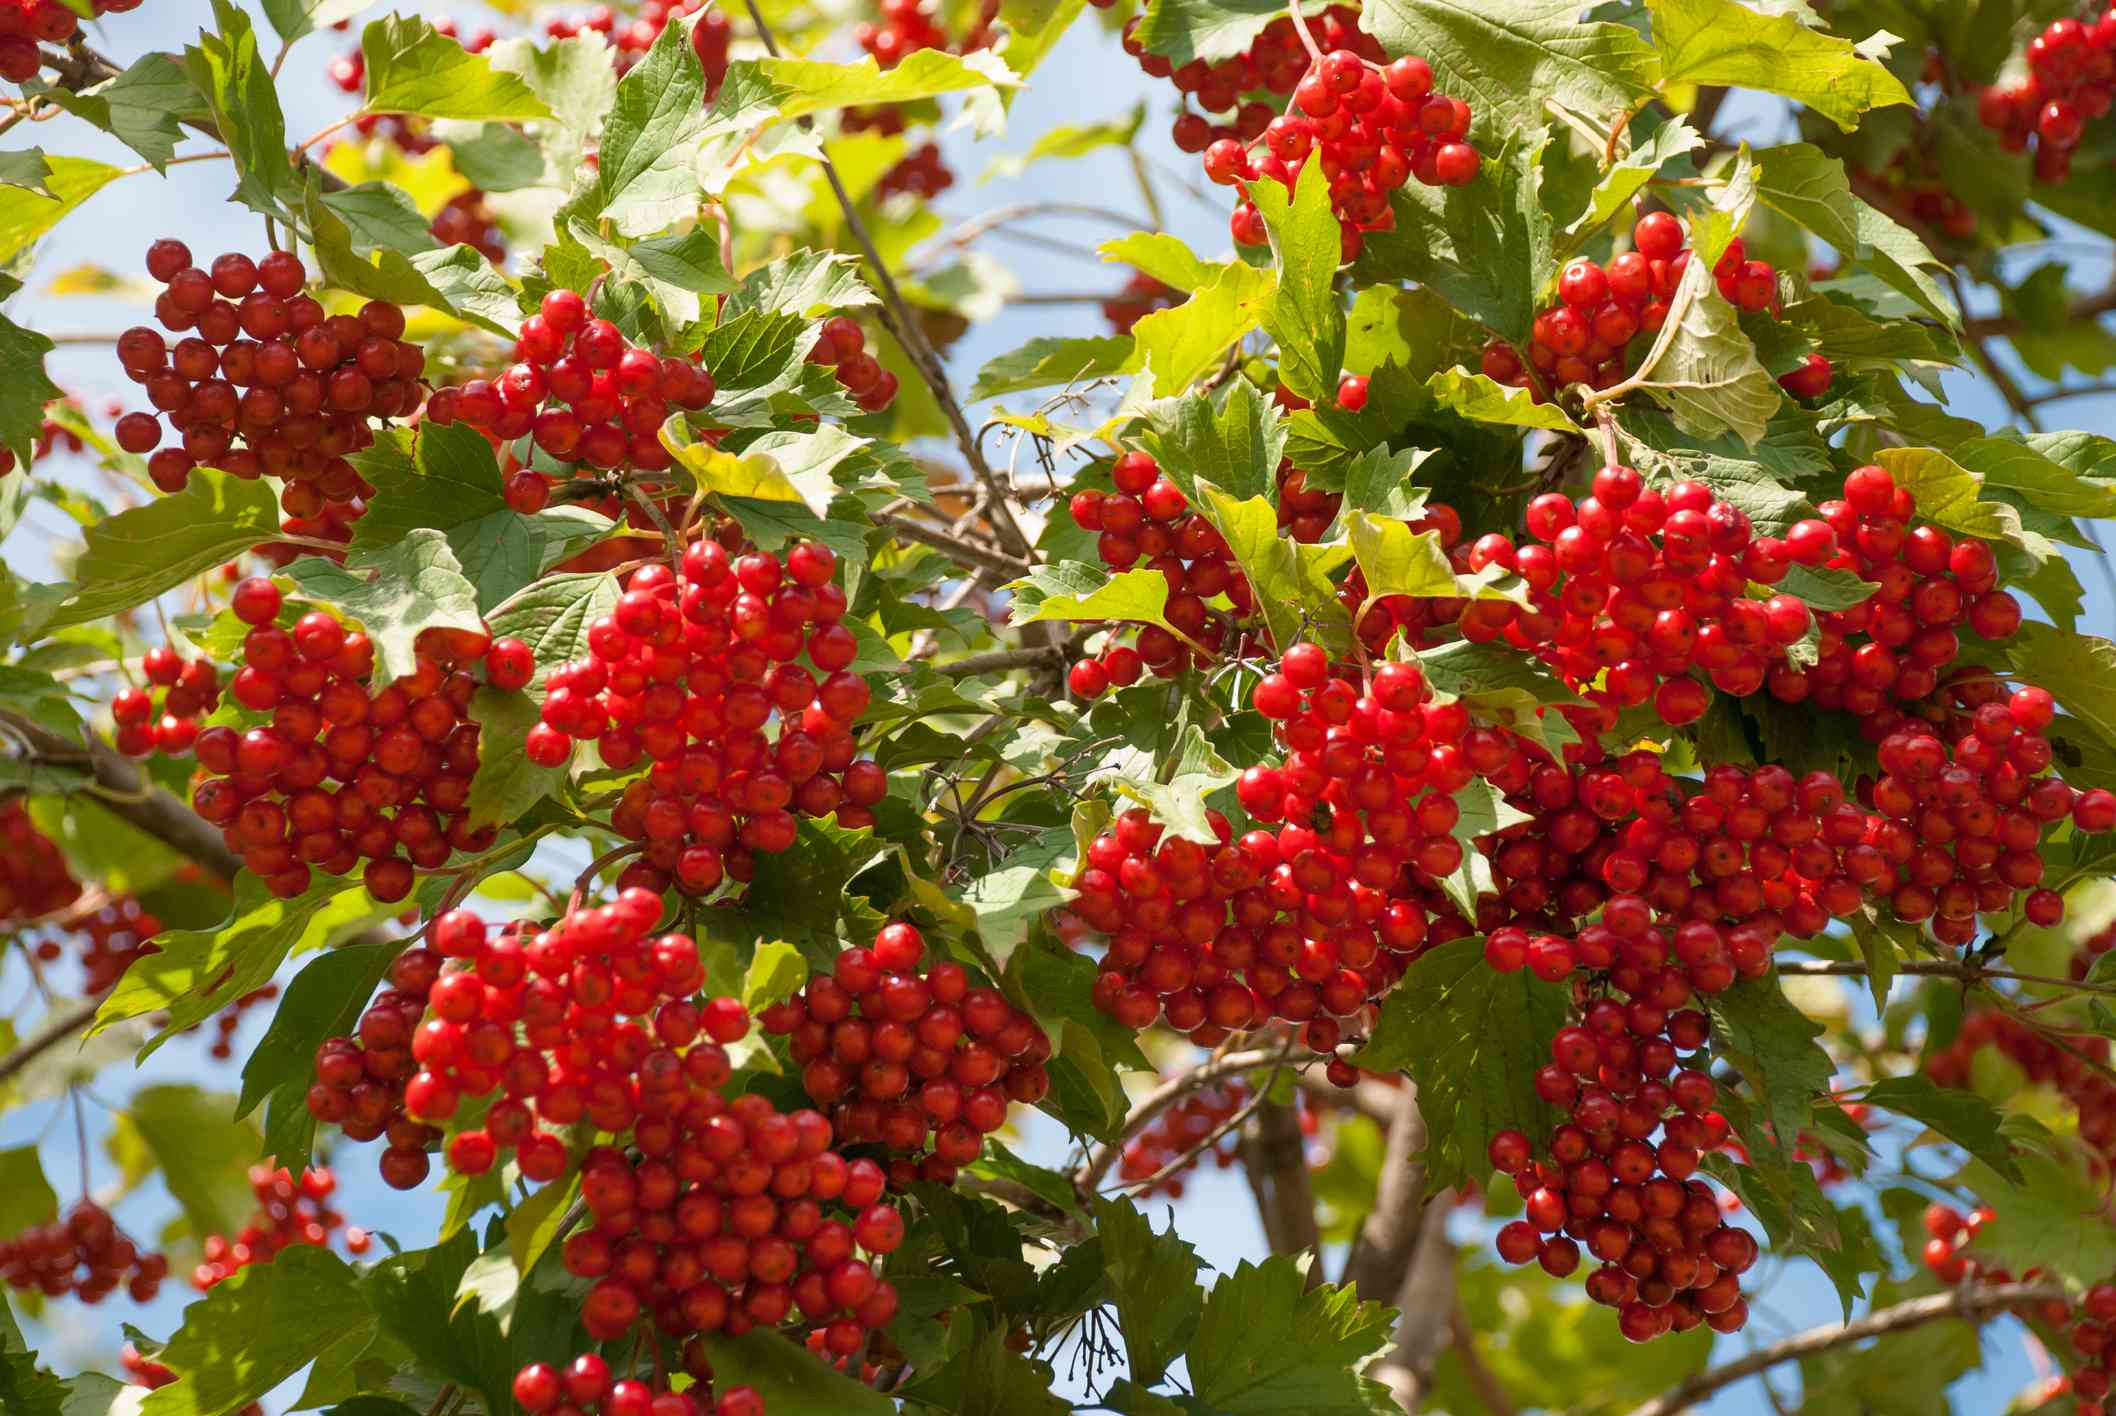 Mapleleaf Viburnum with red berries